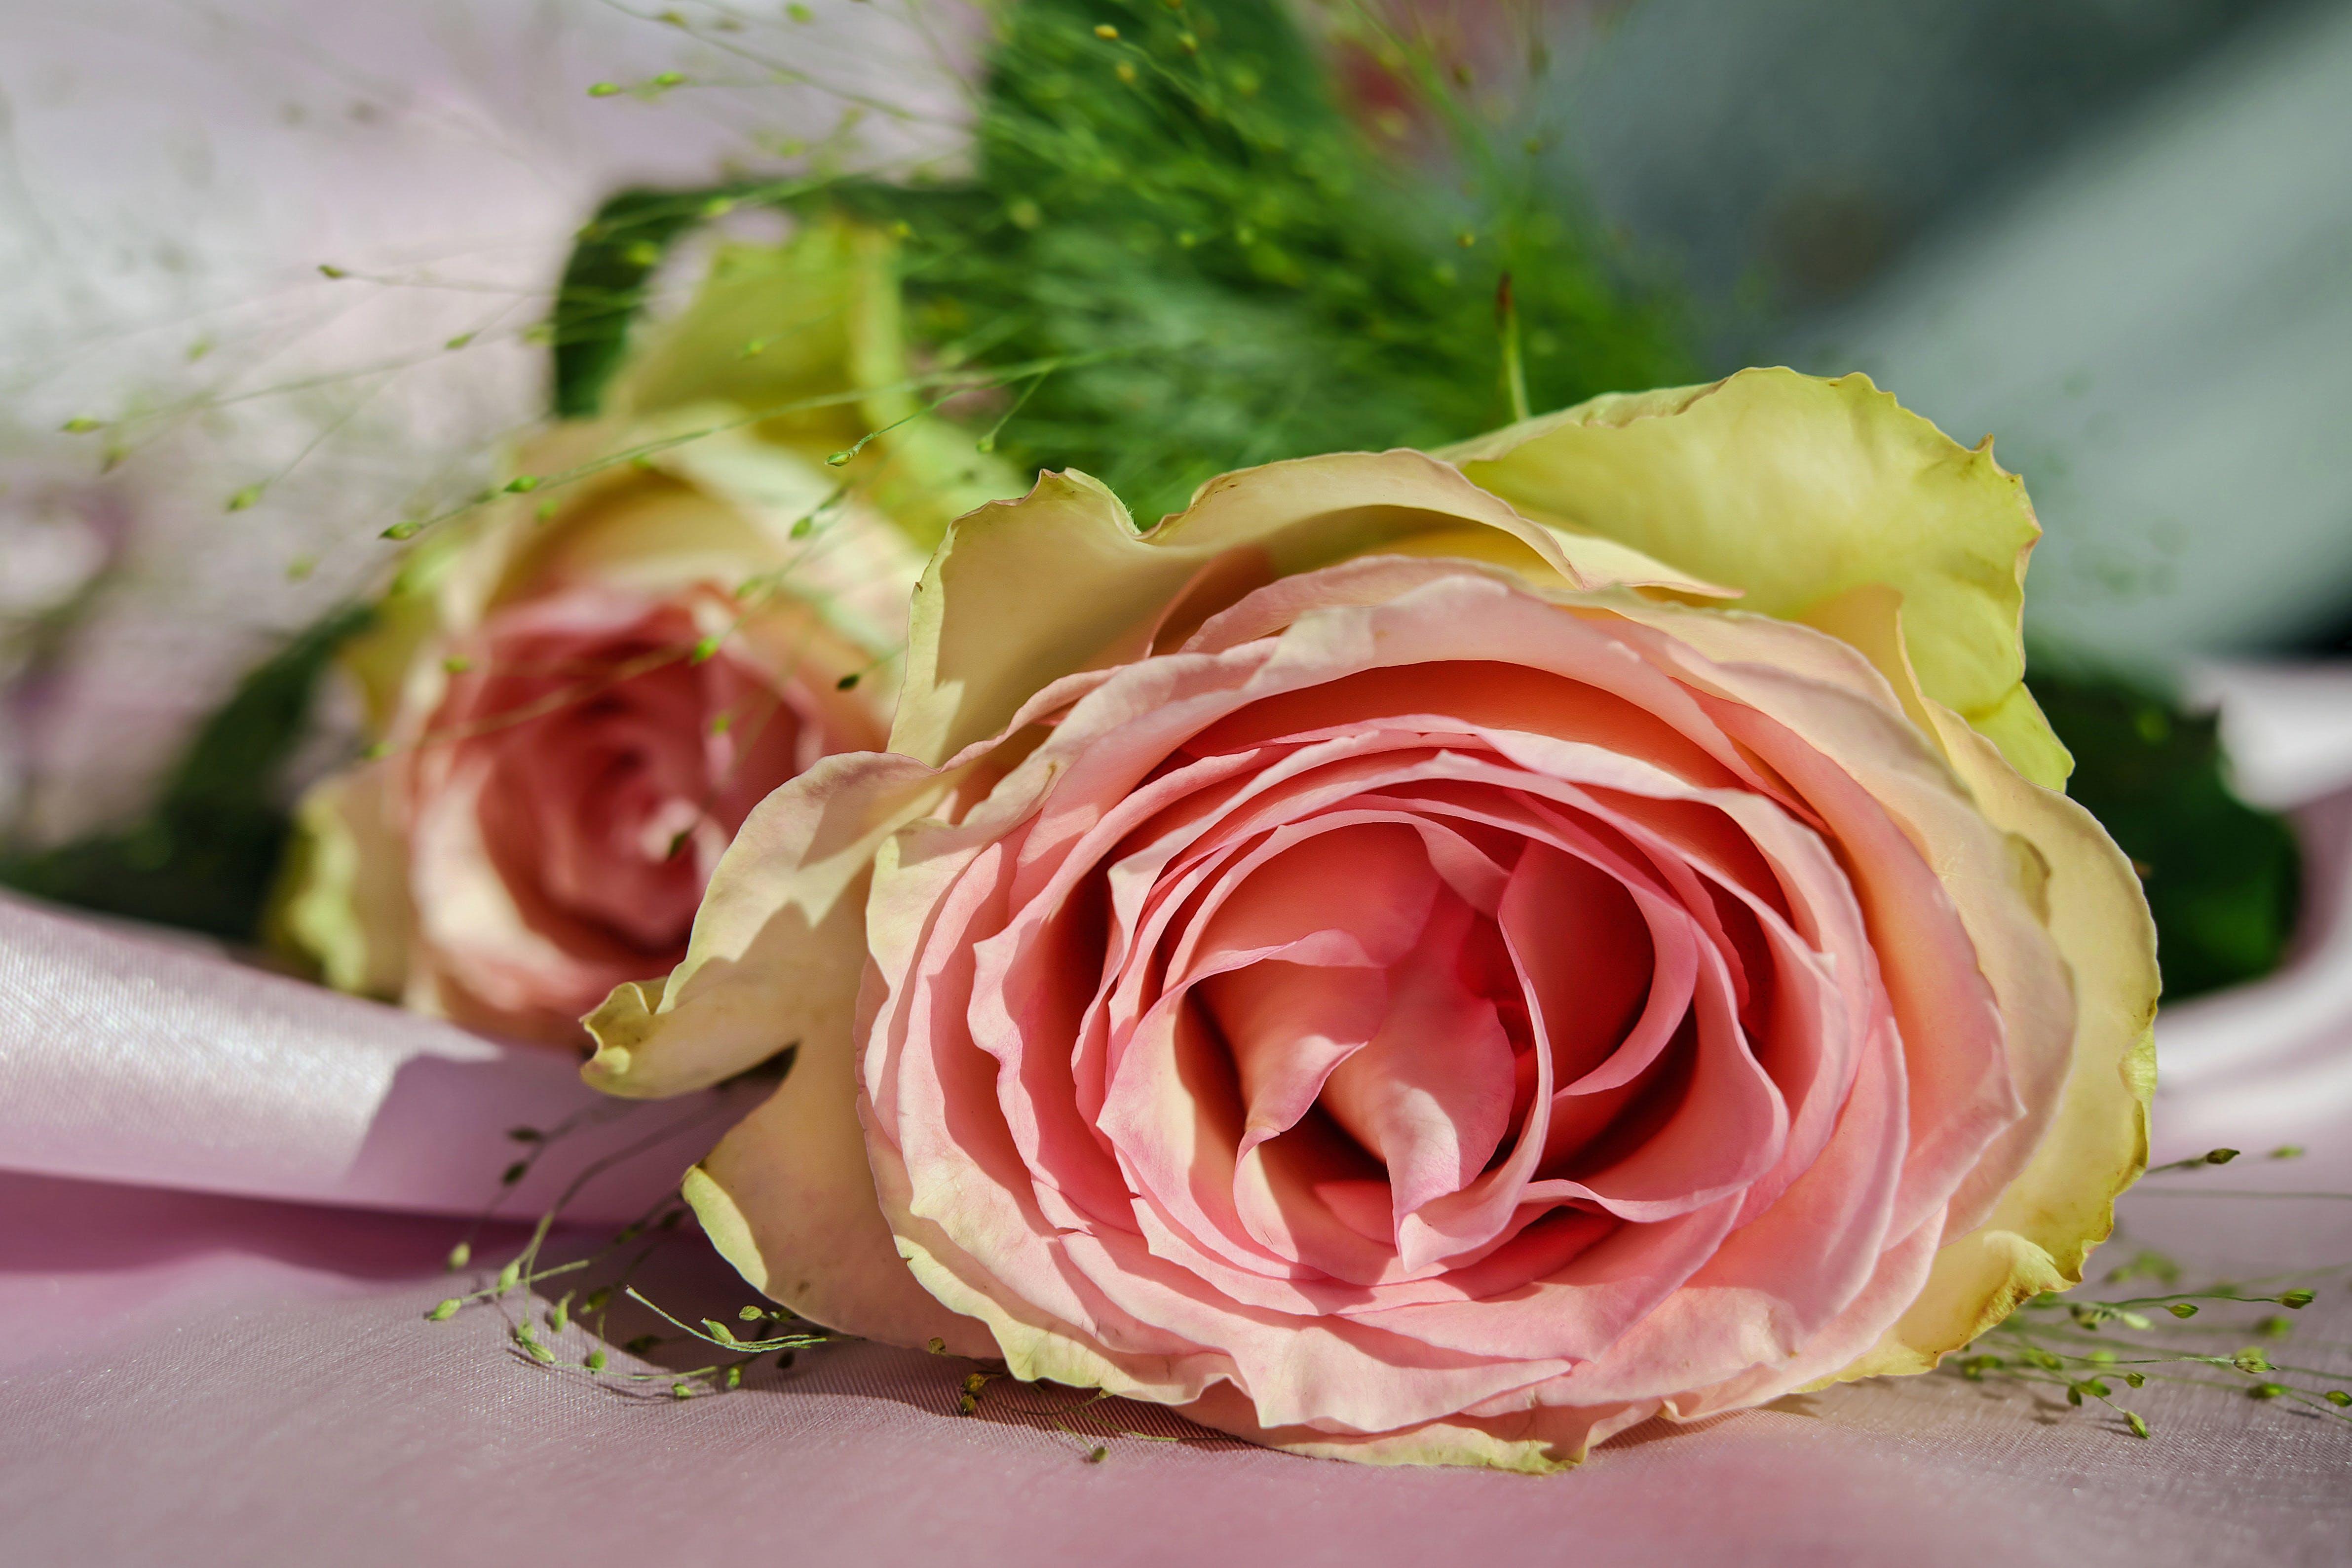 Free stock photo of romantic, flowers, plant, flower